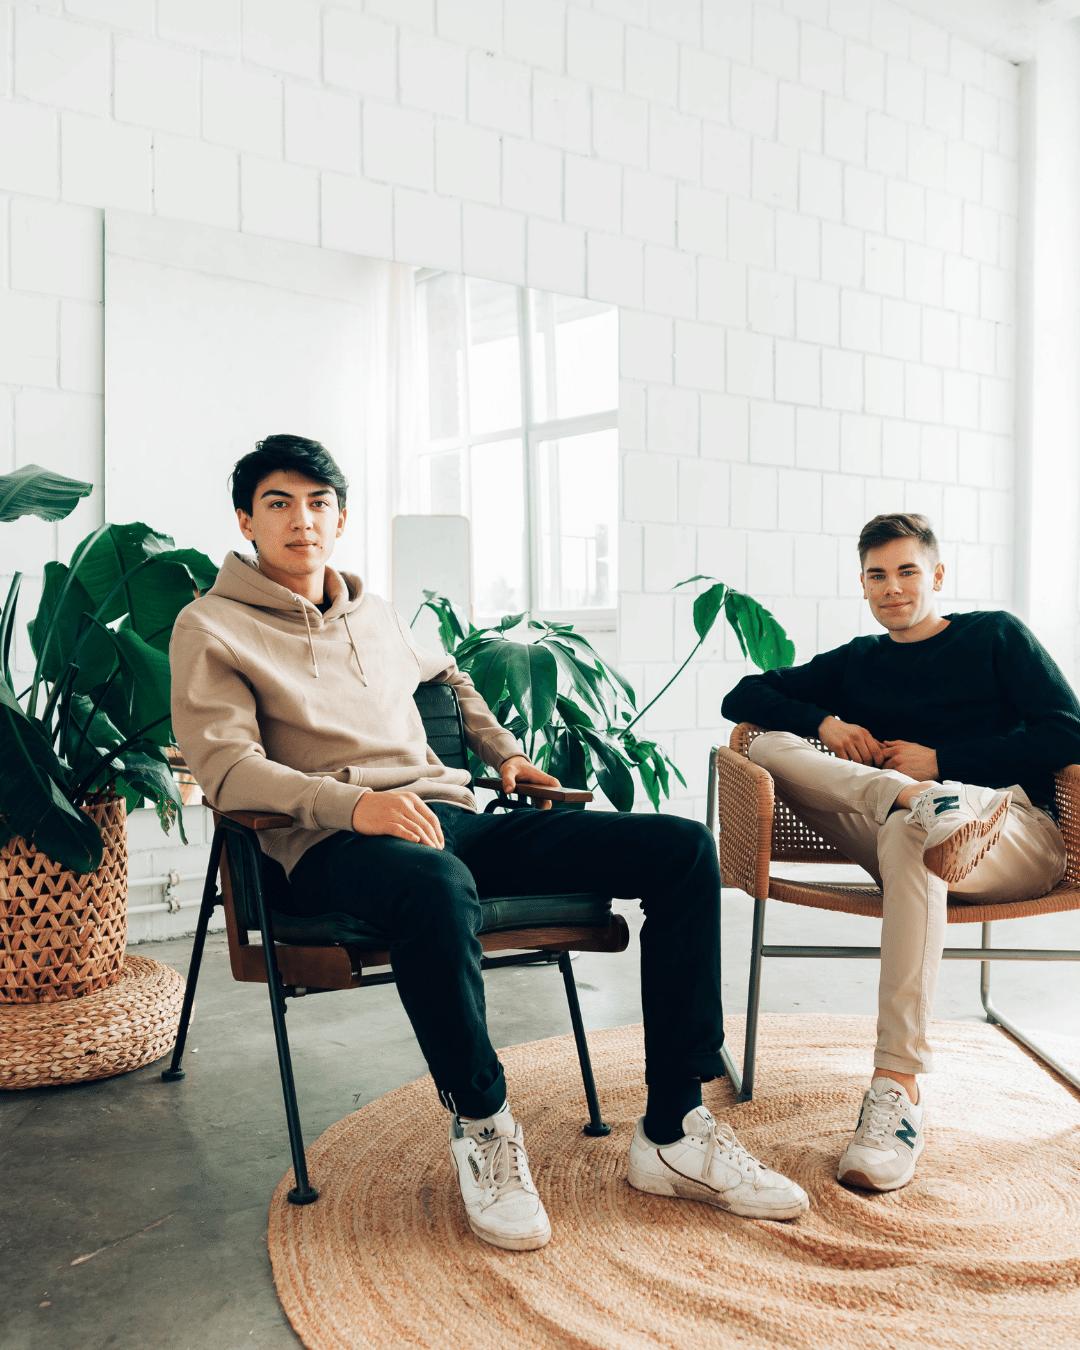 Finn Bußberg and Kai Funada Classen